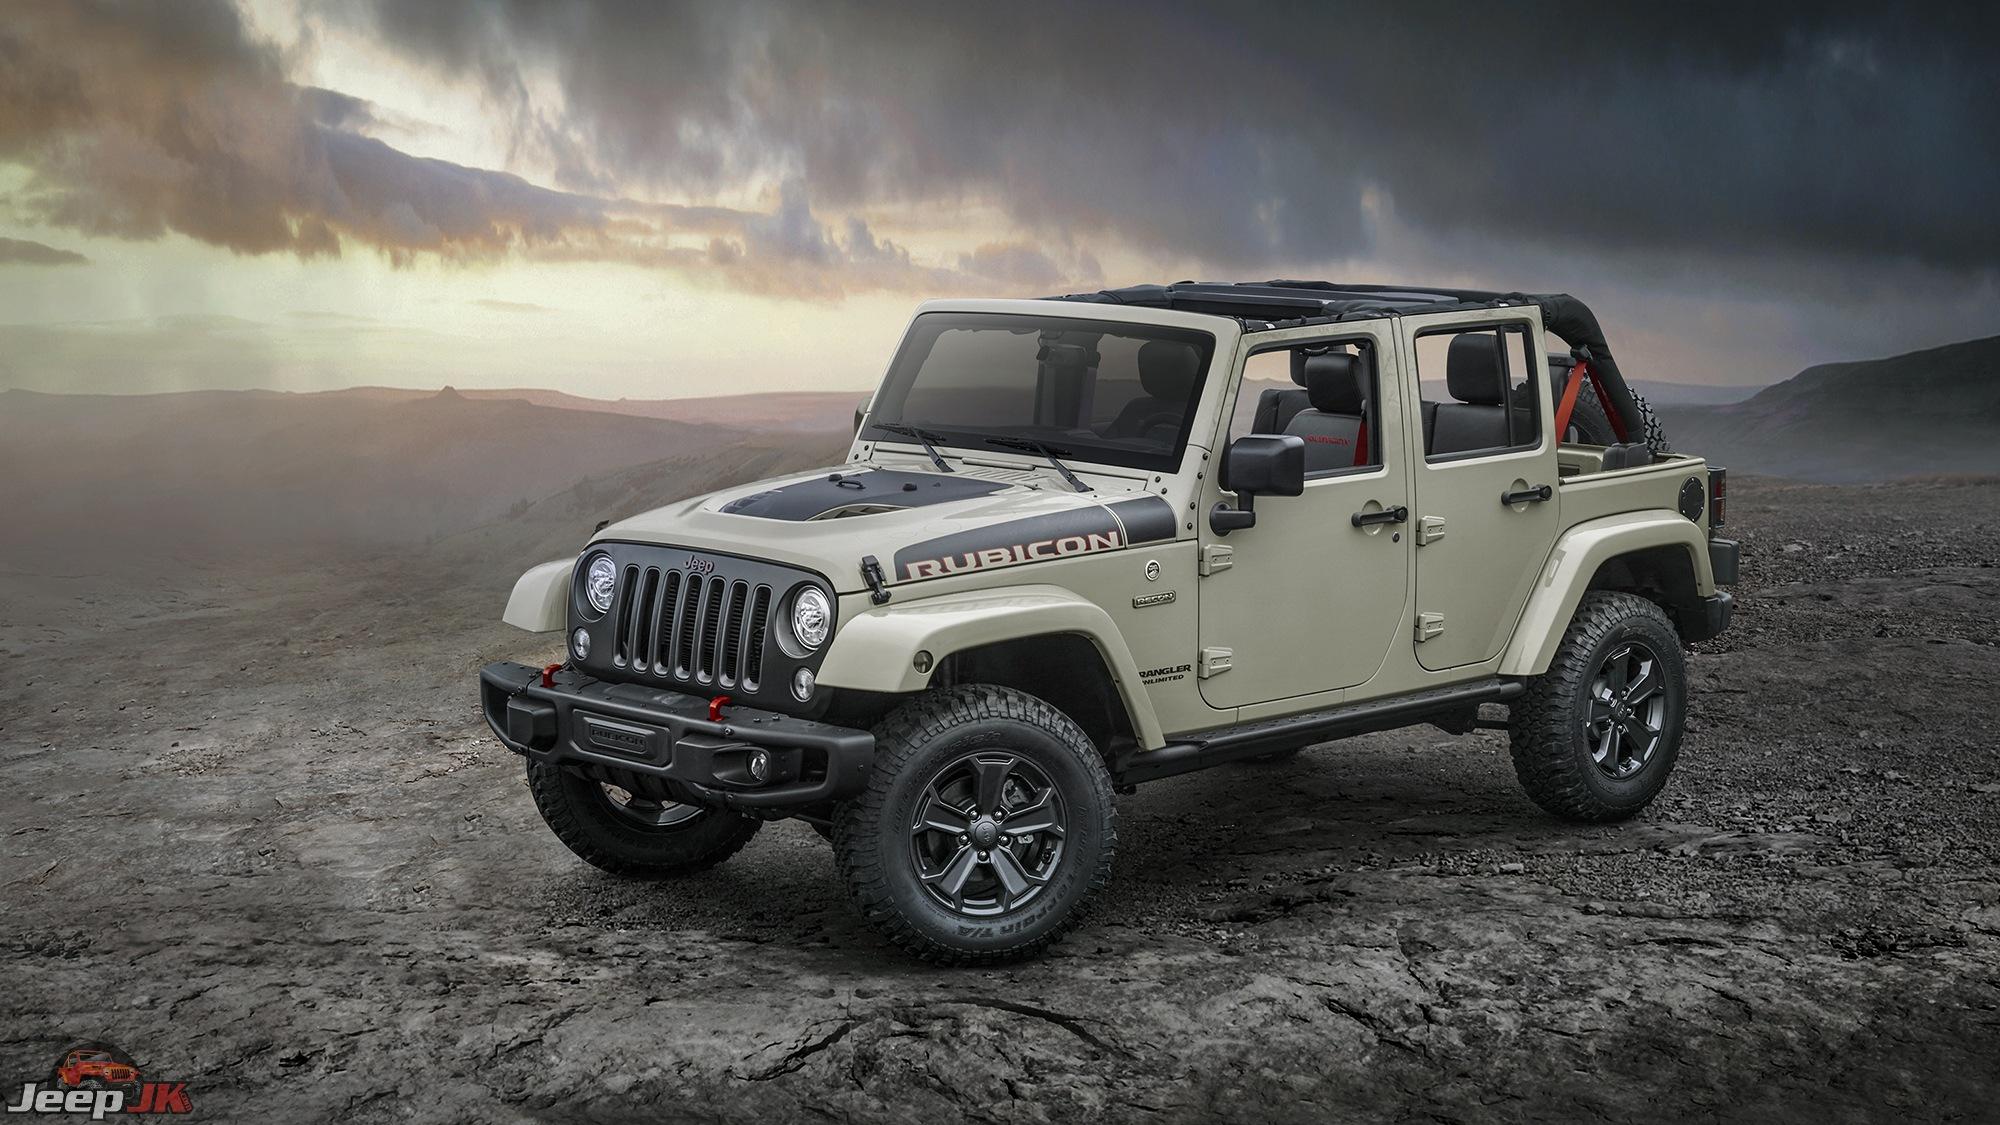 Jeep Wrangler Rubicon Recon Special Edition Jeep Jk